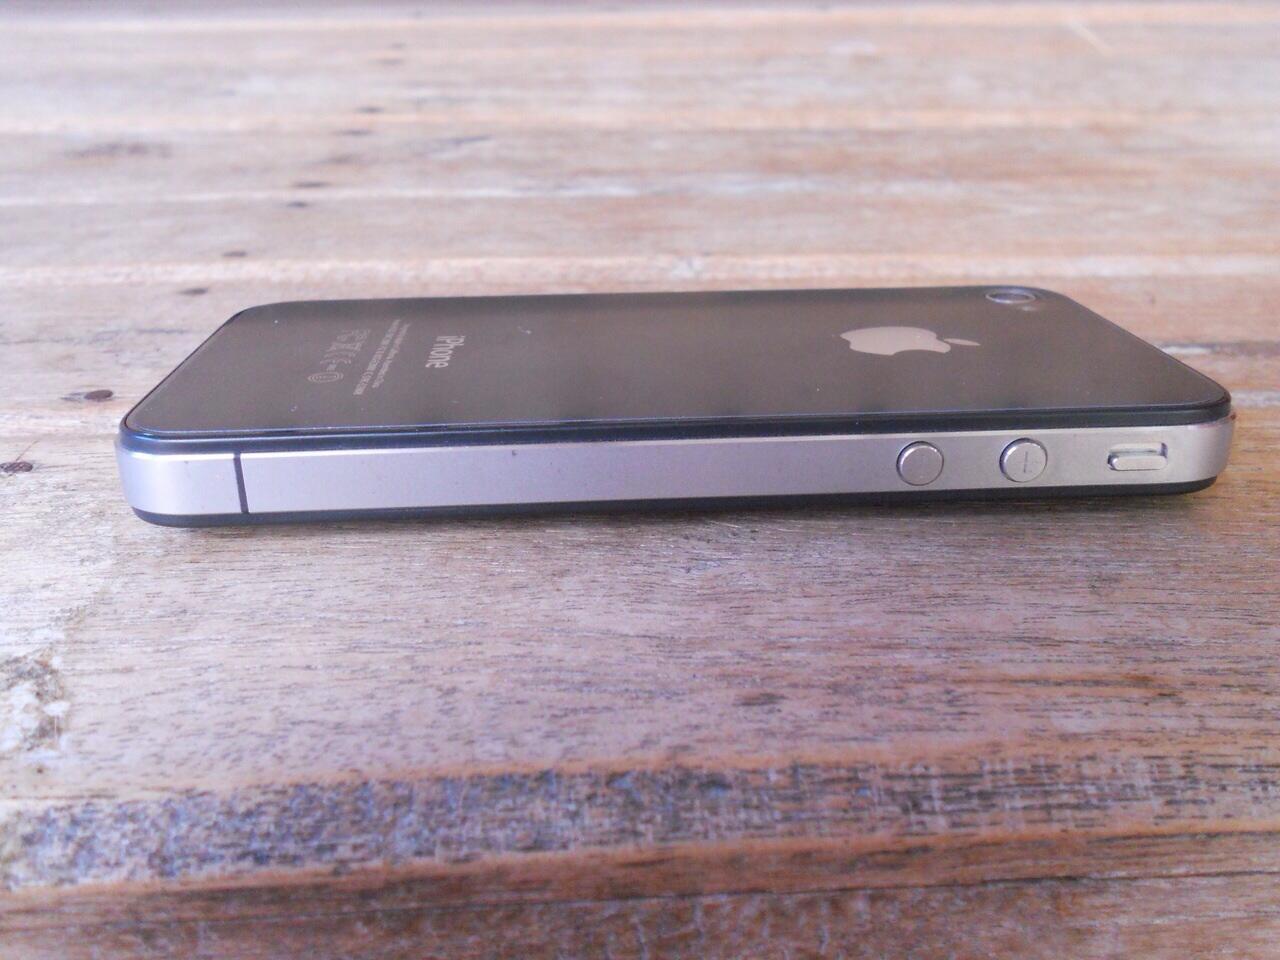 Jual iPhone 4G 8GB FU Black Second MULUS gan